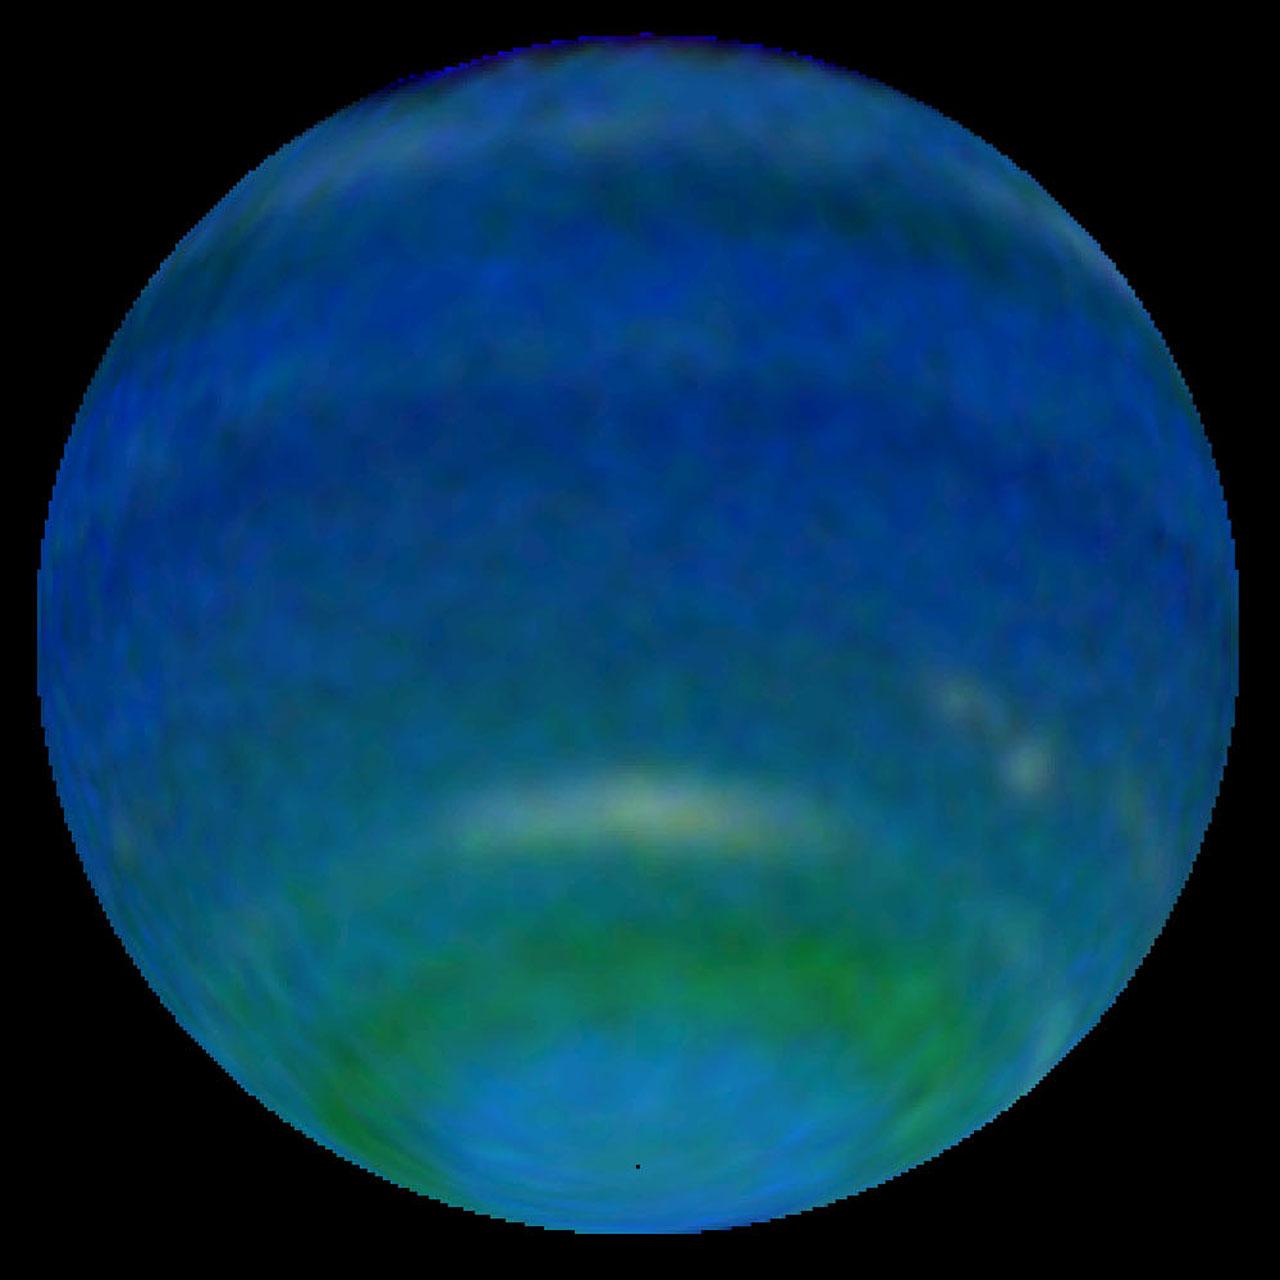 Springtime on Neptune - 1996 Image of Neptune